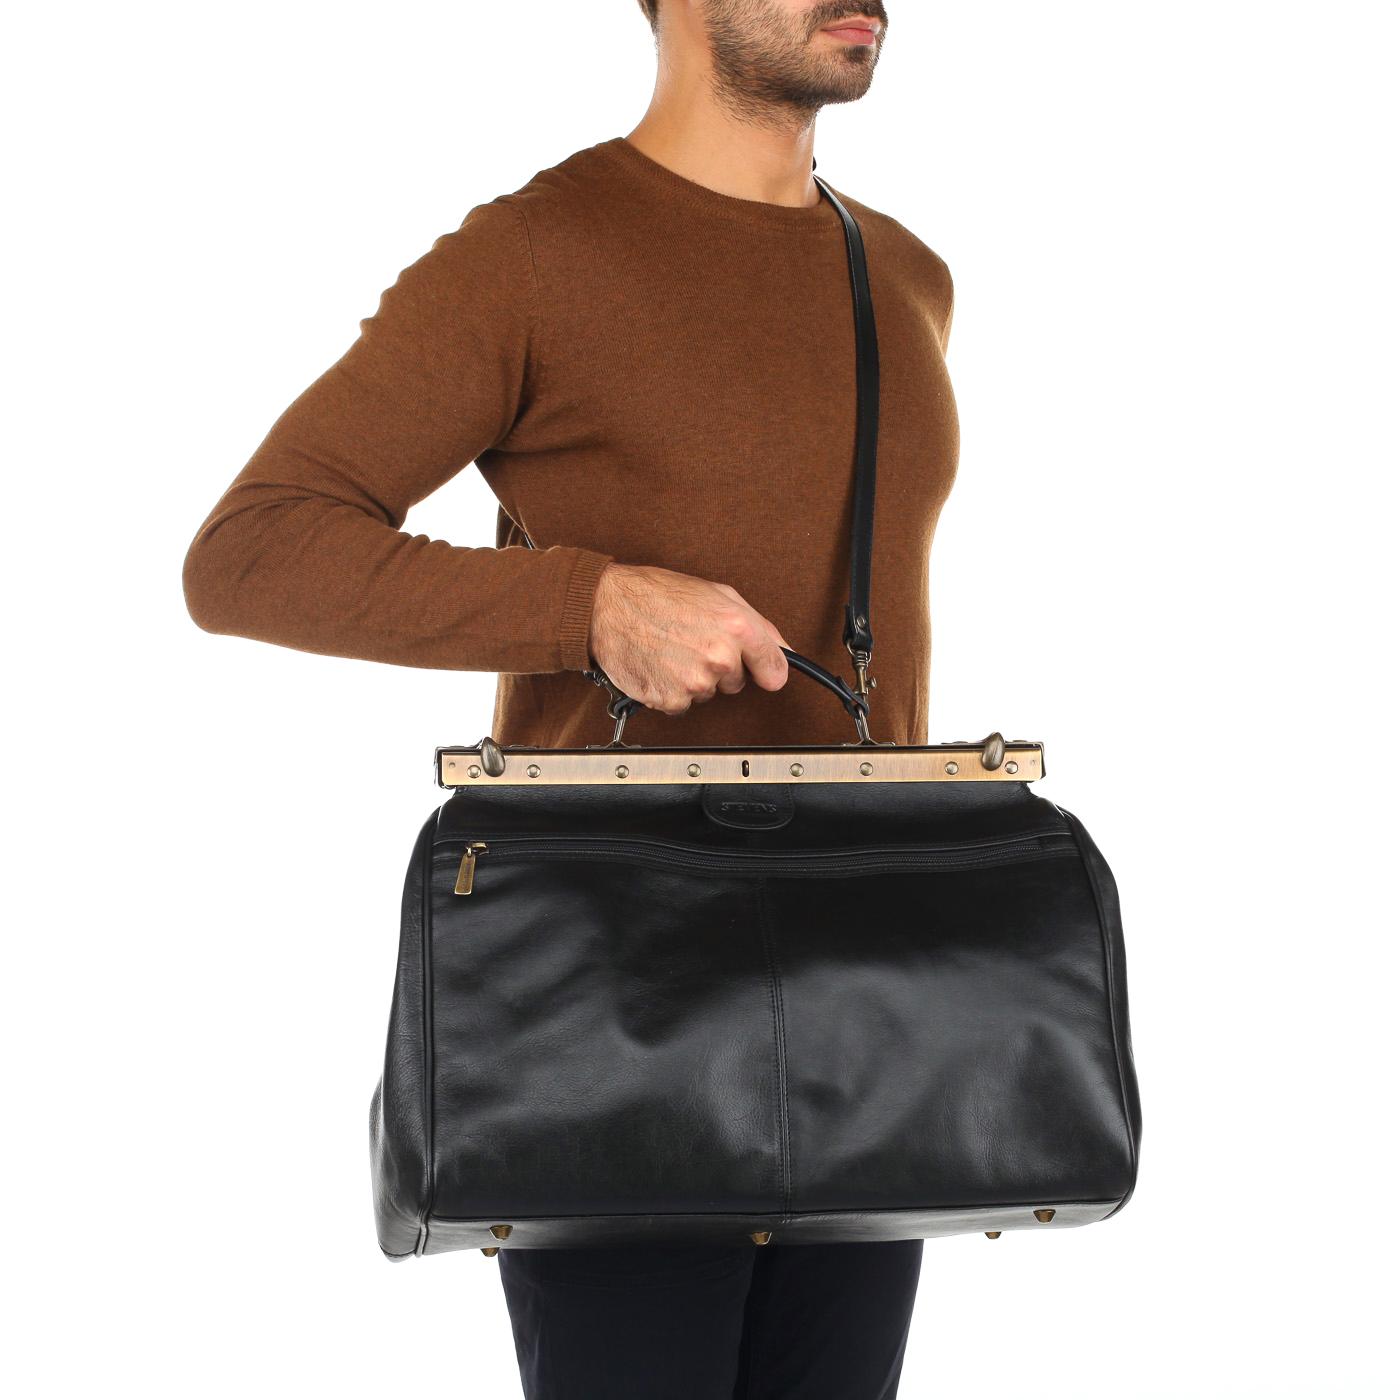 256862dfd5f3 Кожаная винтажная сумка-саквояж Stevens STA-2974/V-nero ...